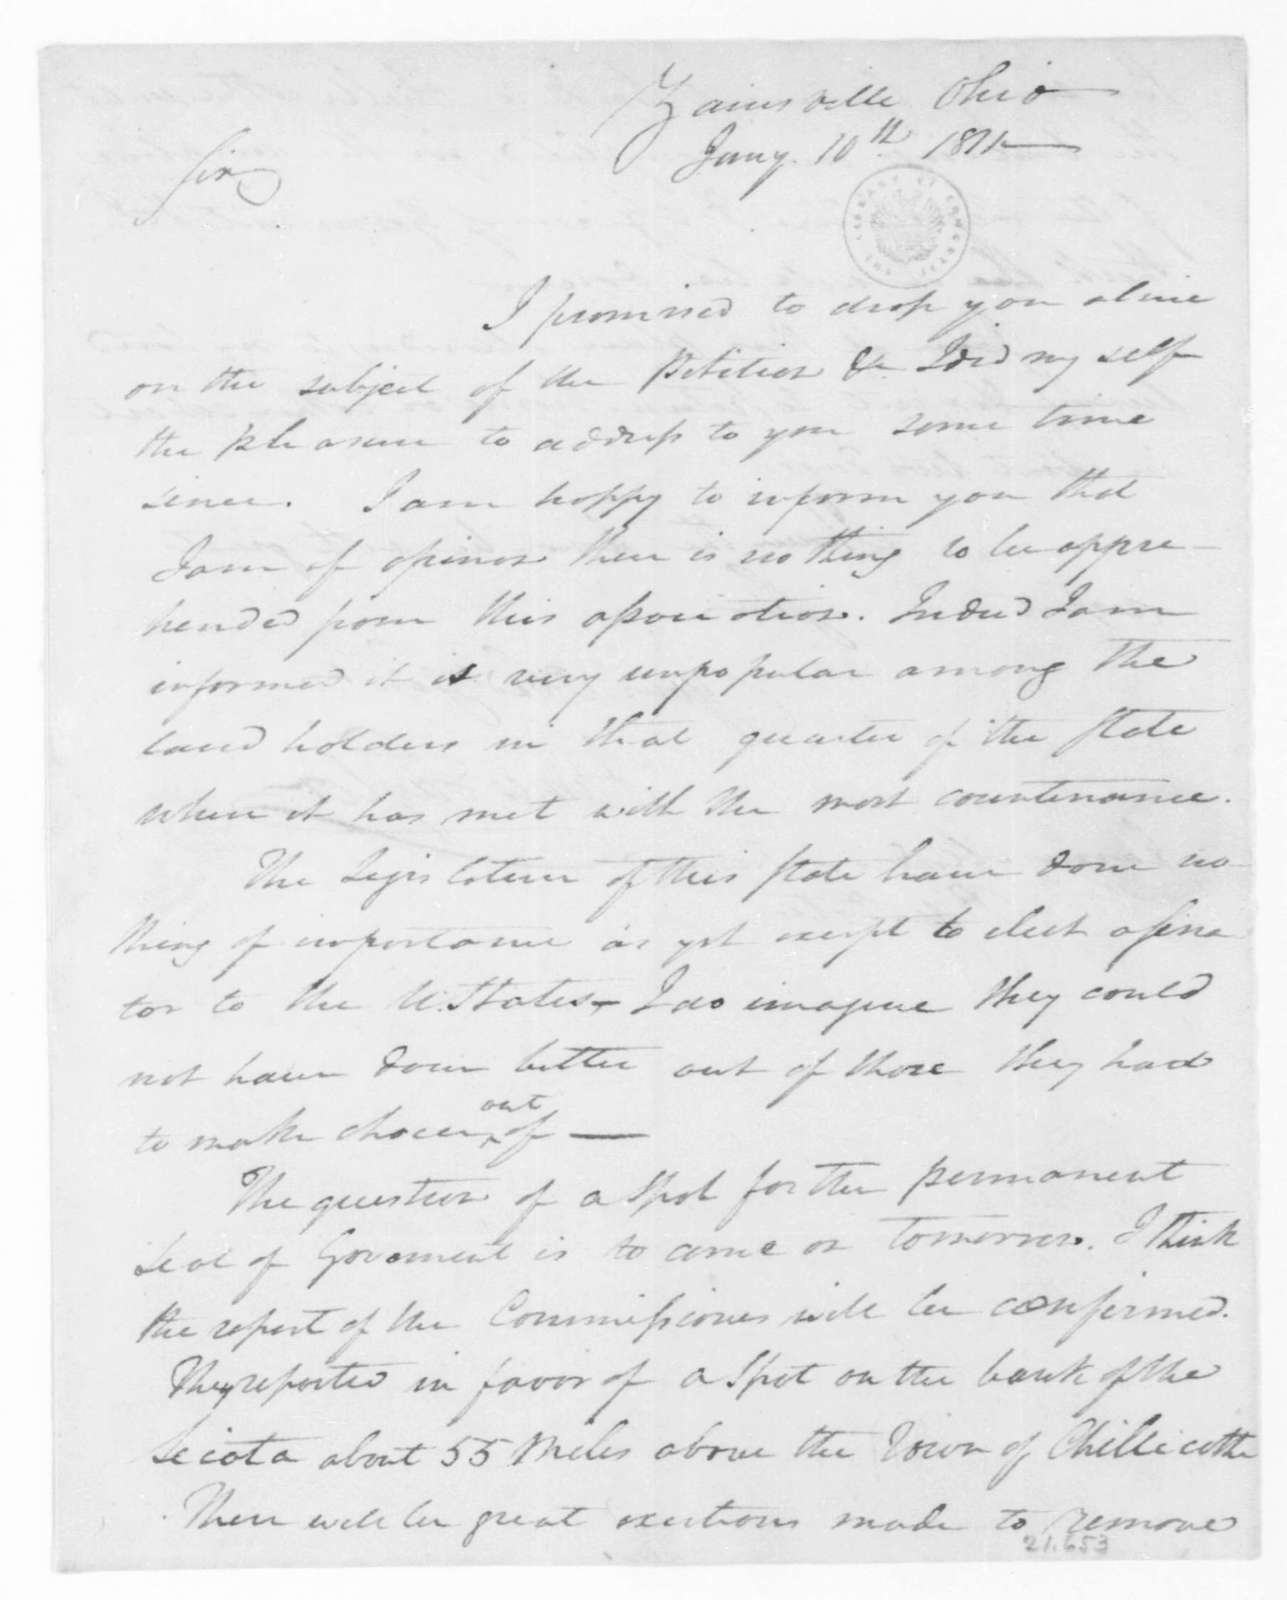 James Taylor to James Madison, January 10, 1811.